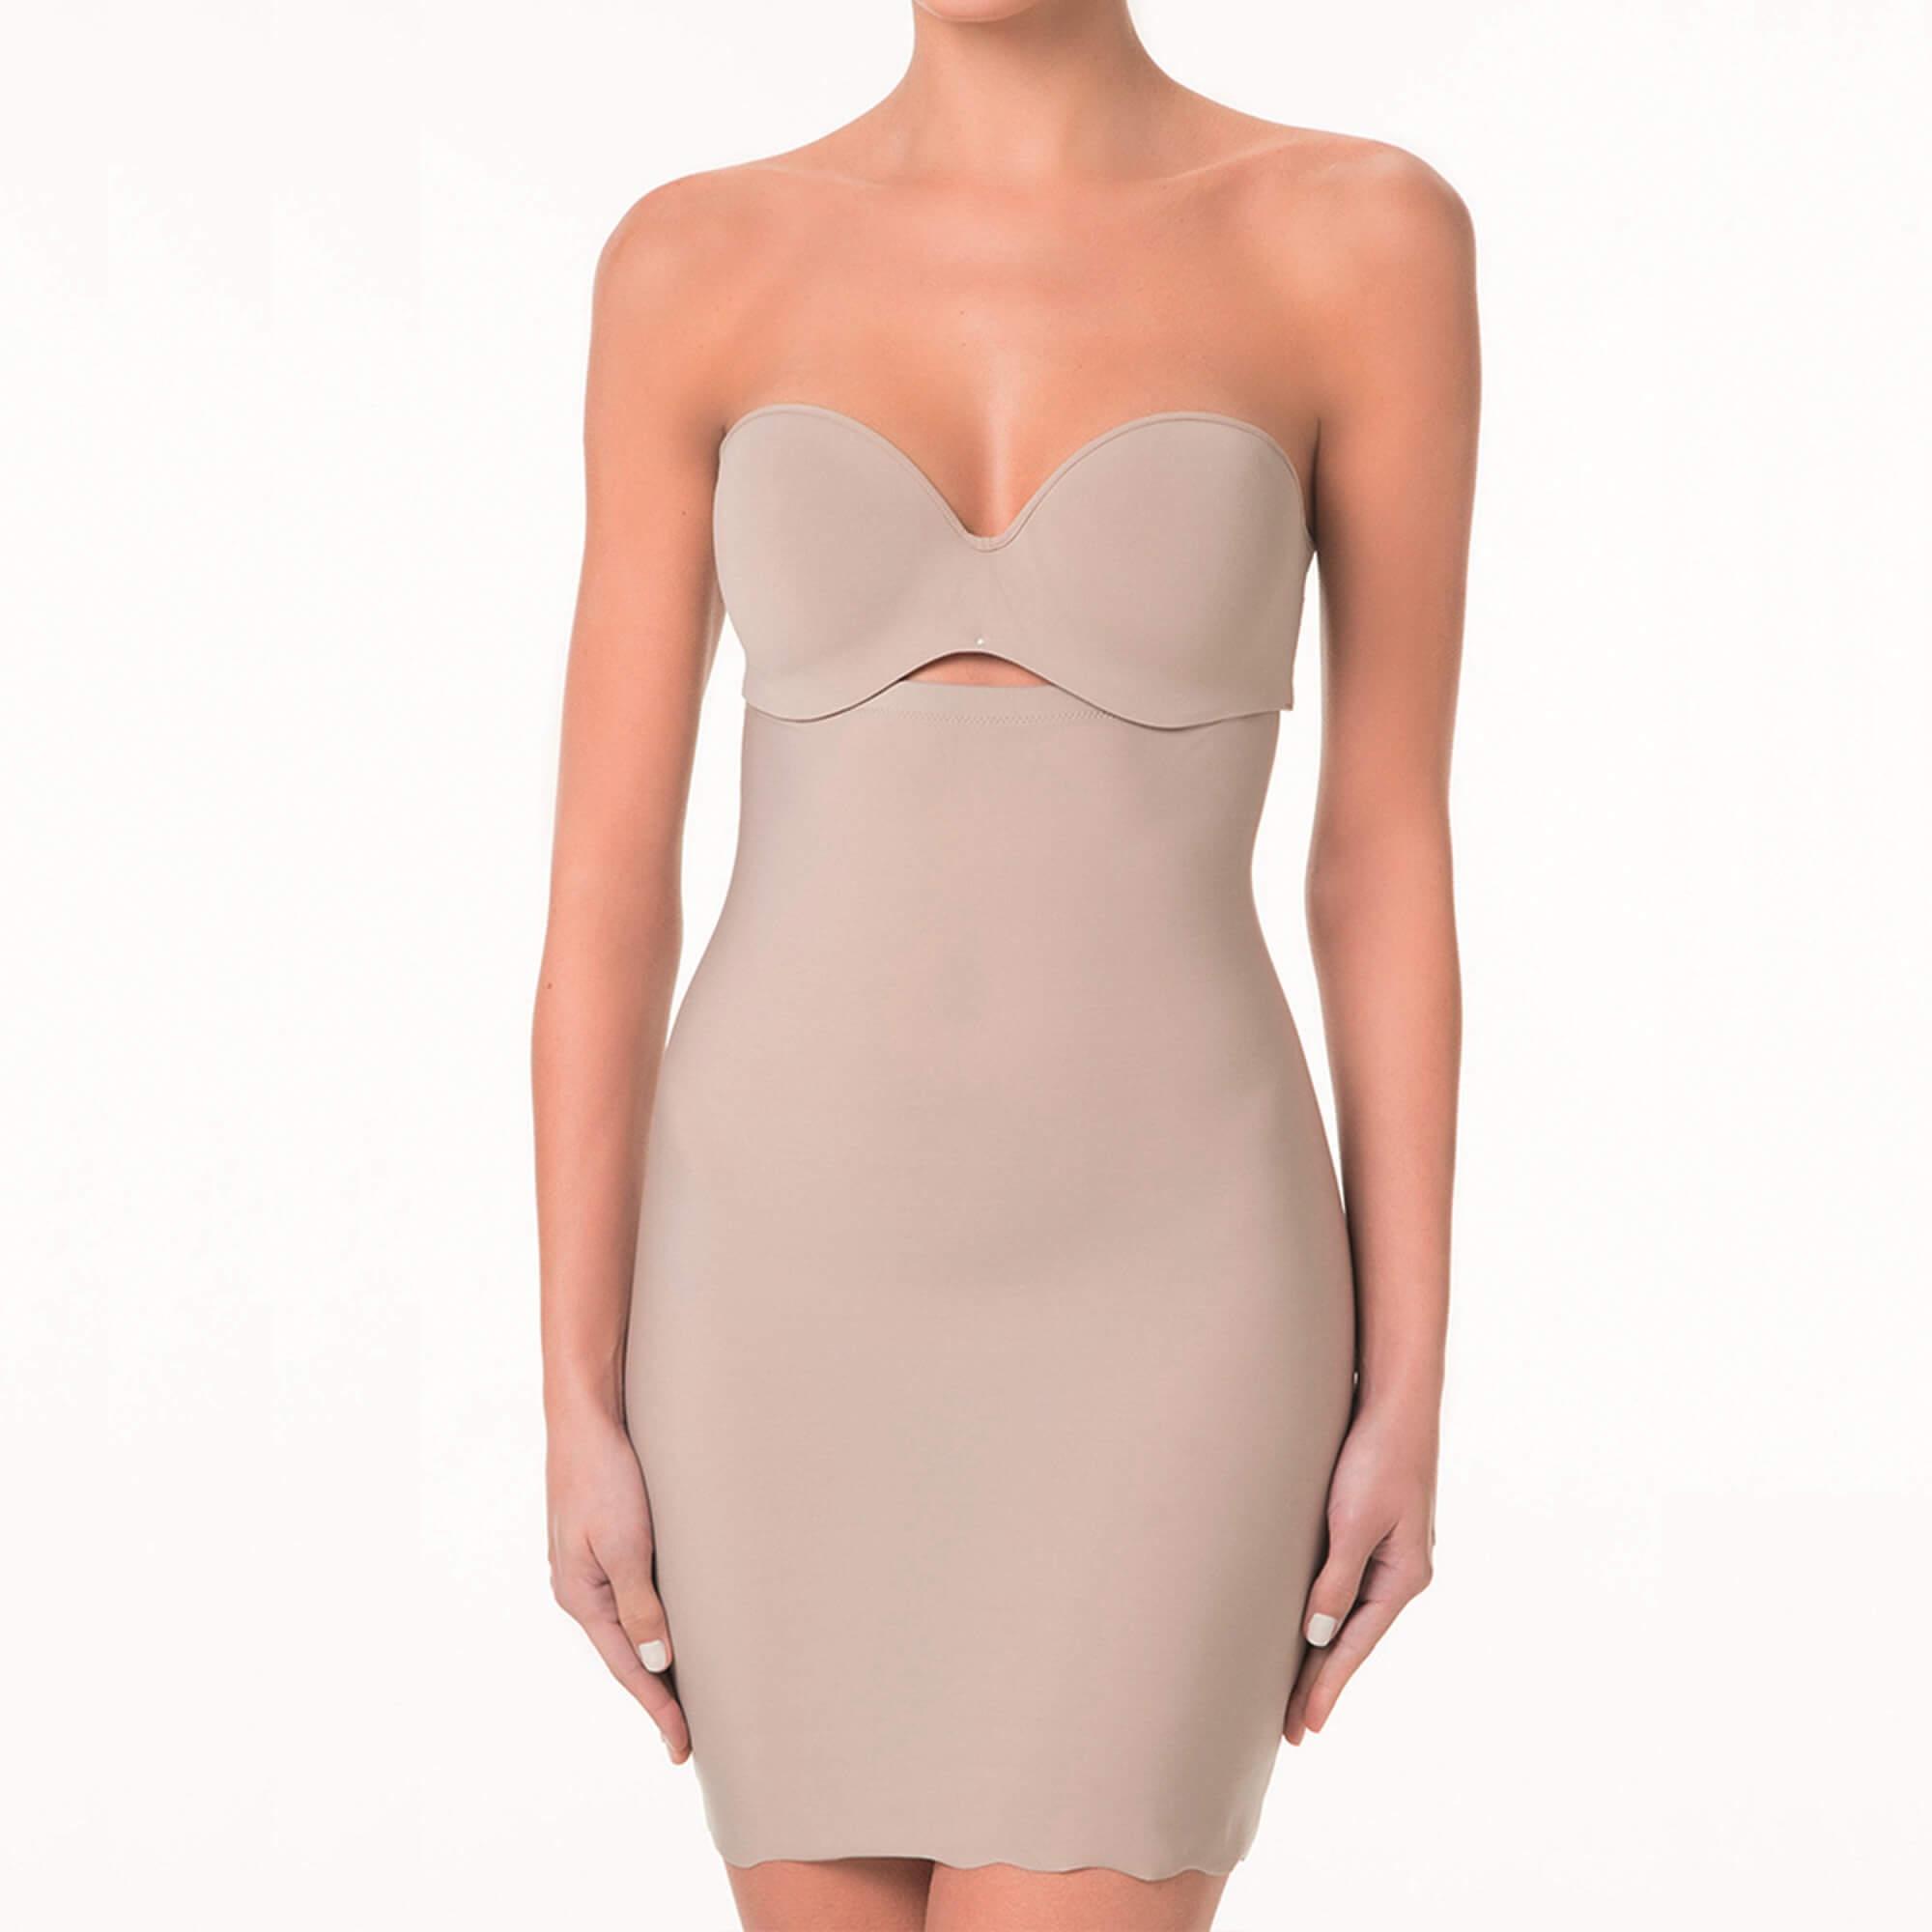 Combinação Semi-vestido 55694 ( Liz)